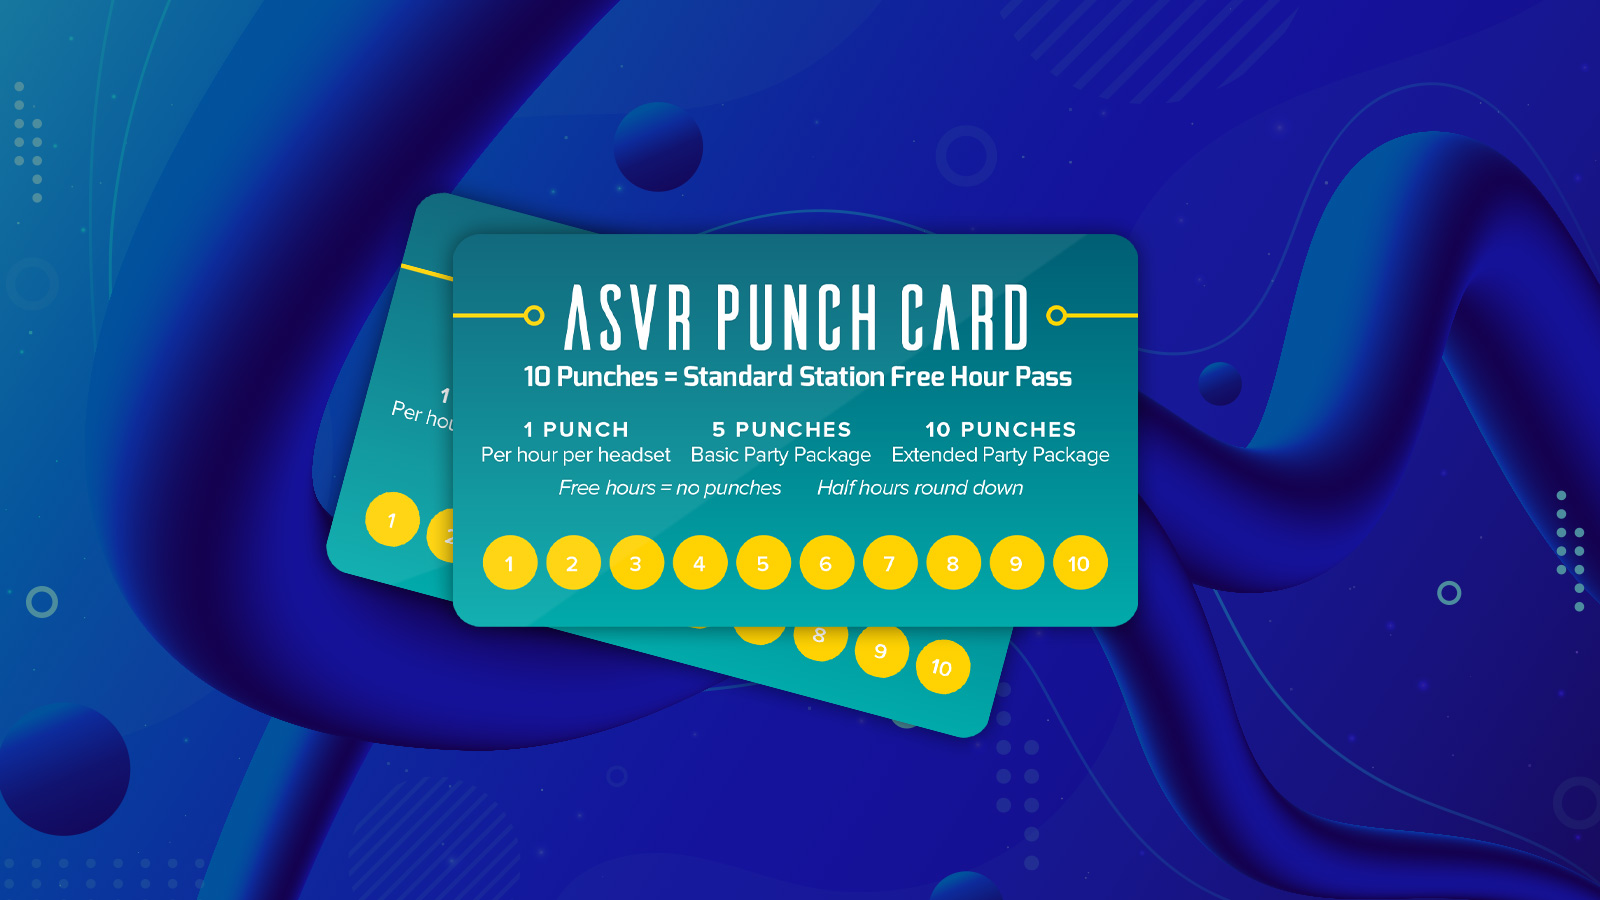 ASVR-Punch-Card-Blog-V1.jpg